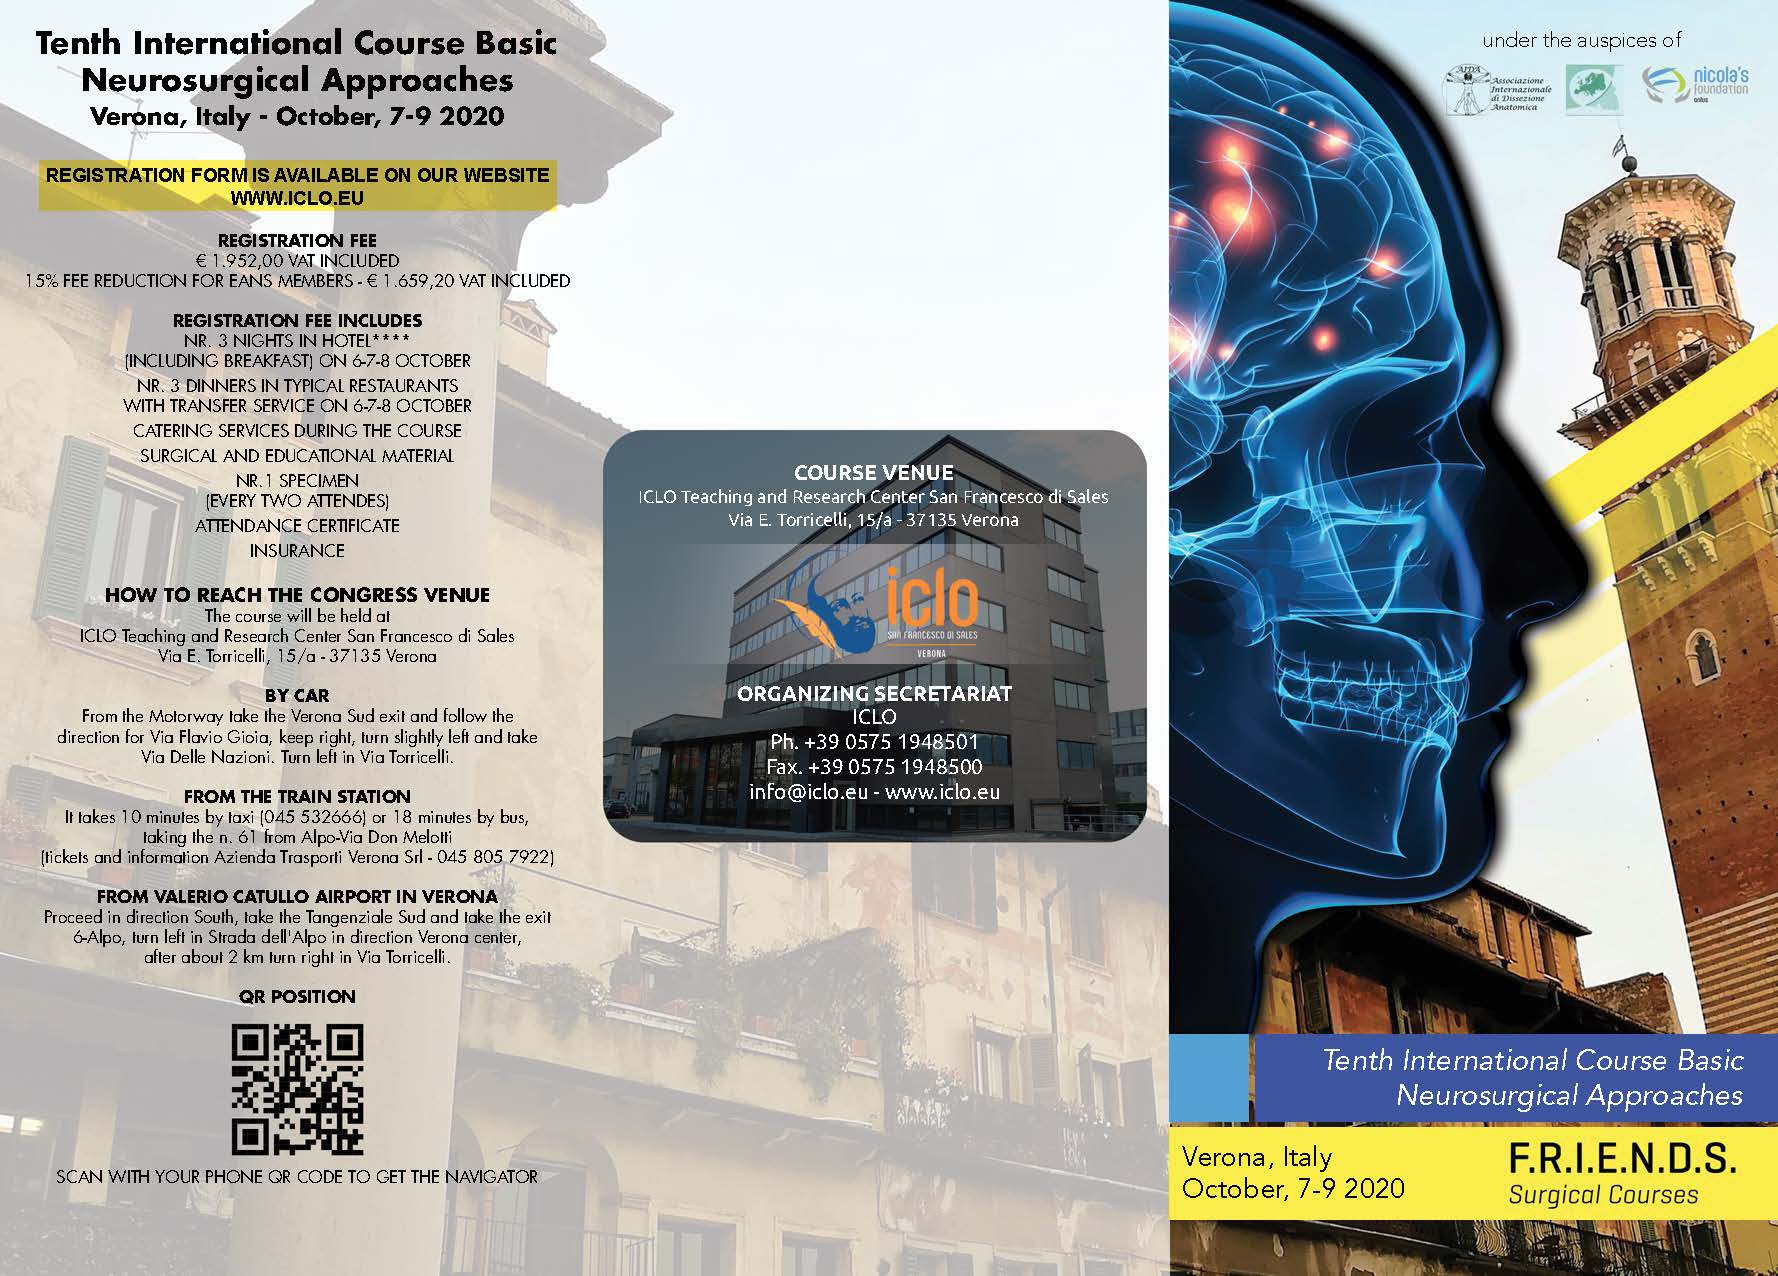 ProgrammaScientifico_2020_10_7-9-2_Pagina_1